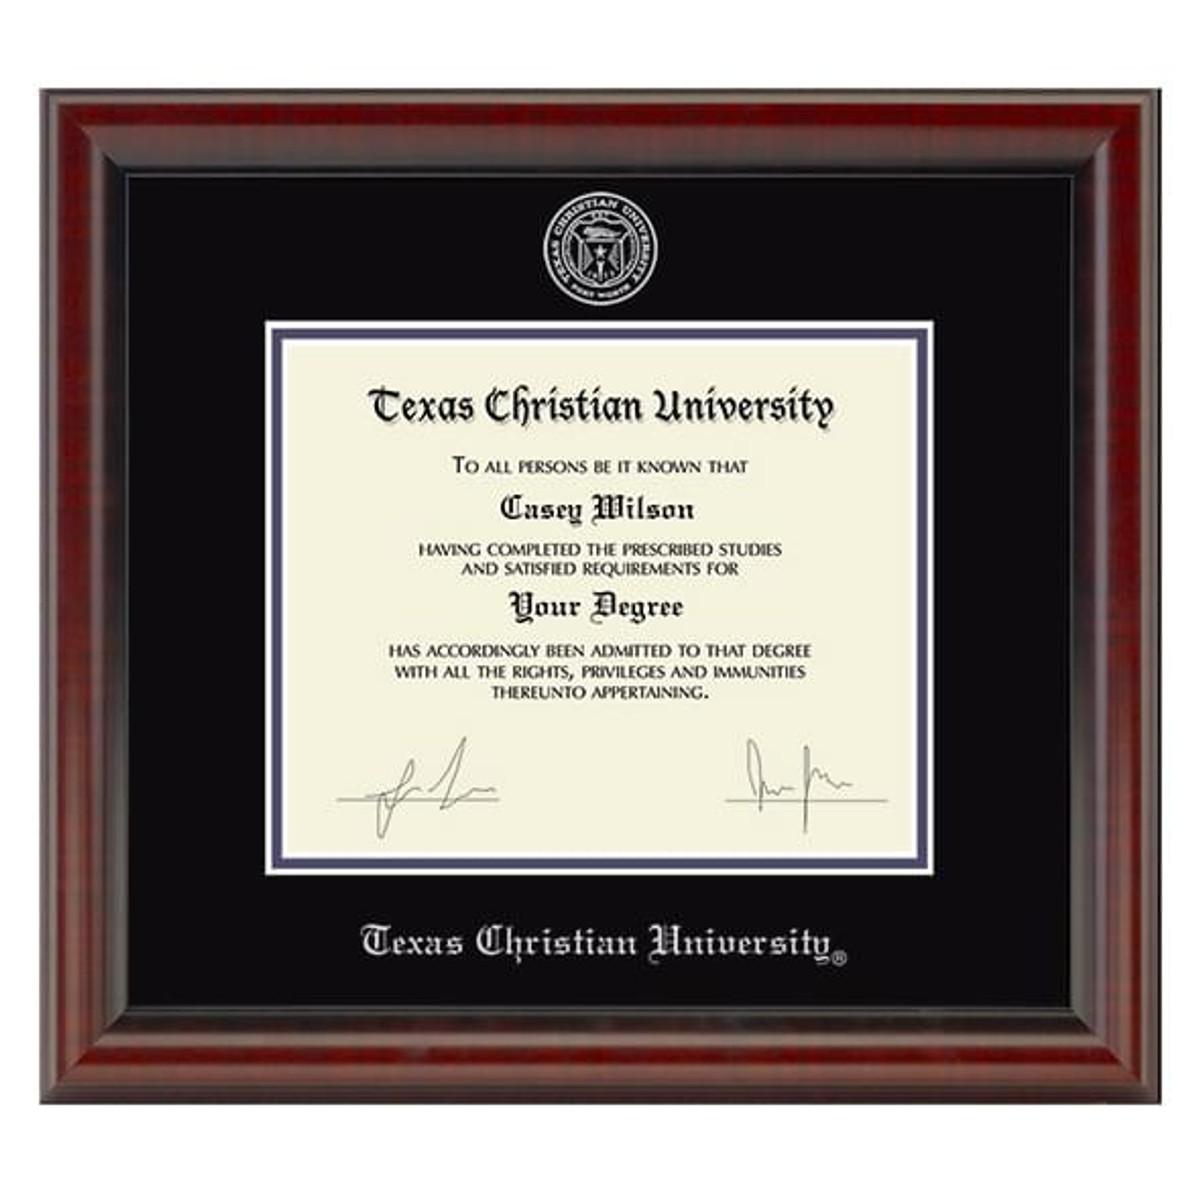 Official Texas Christian University Diploma Frame The